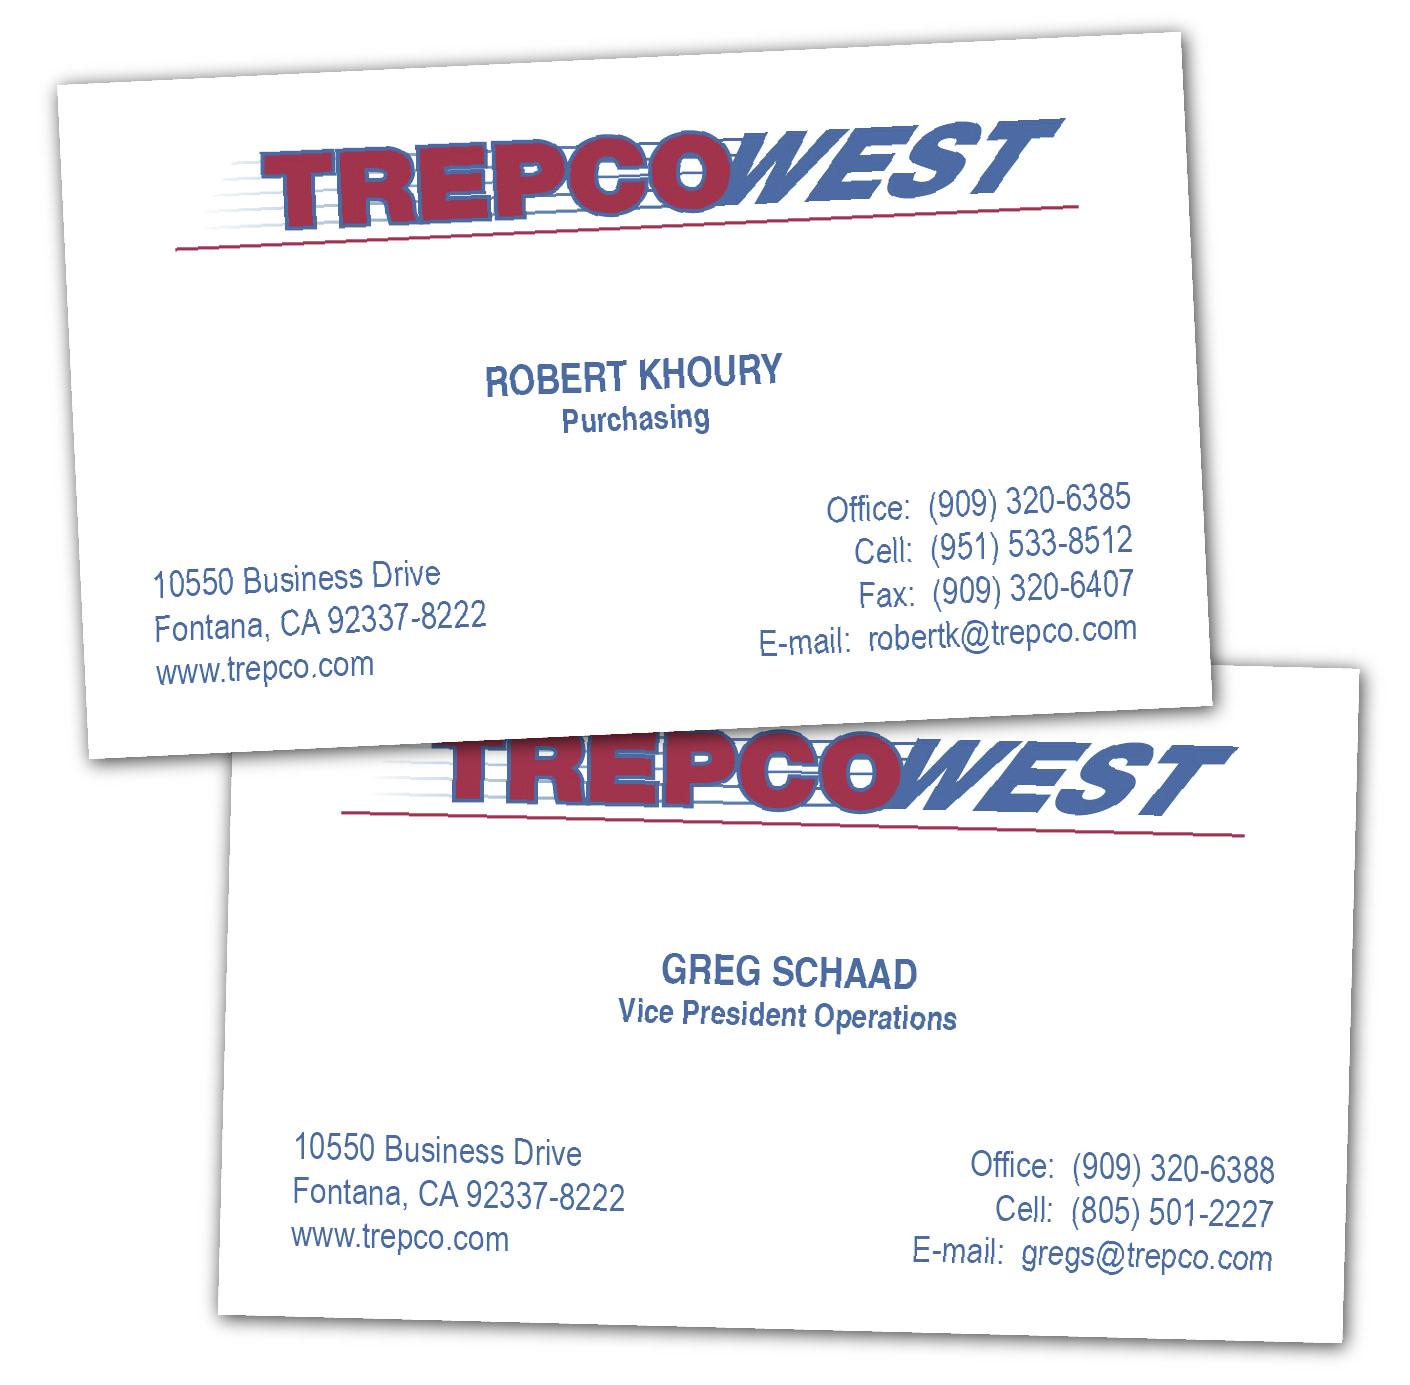 Trepco business card-01.jpg